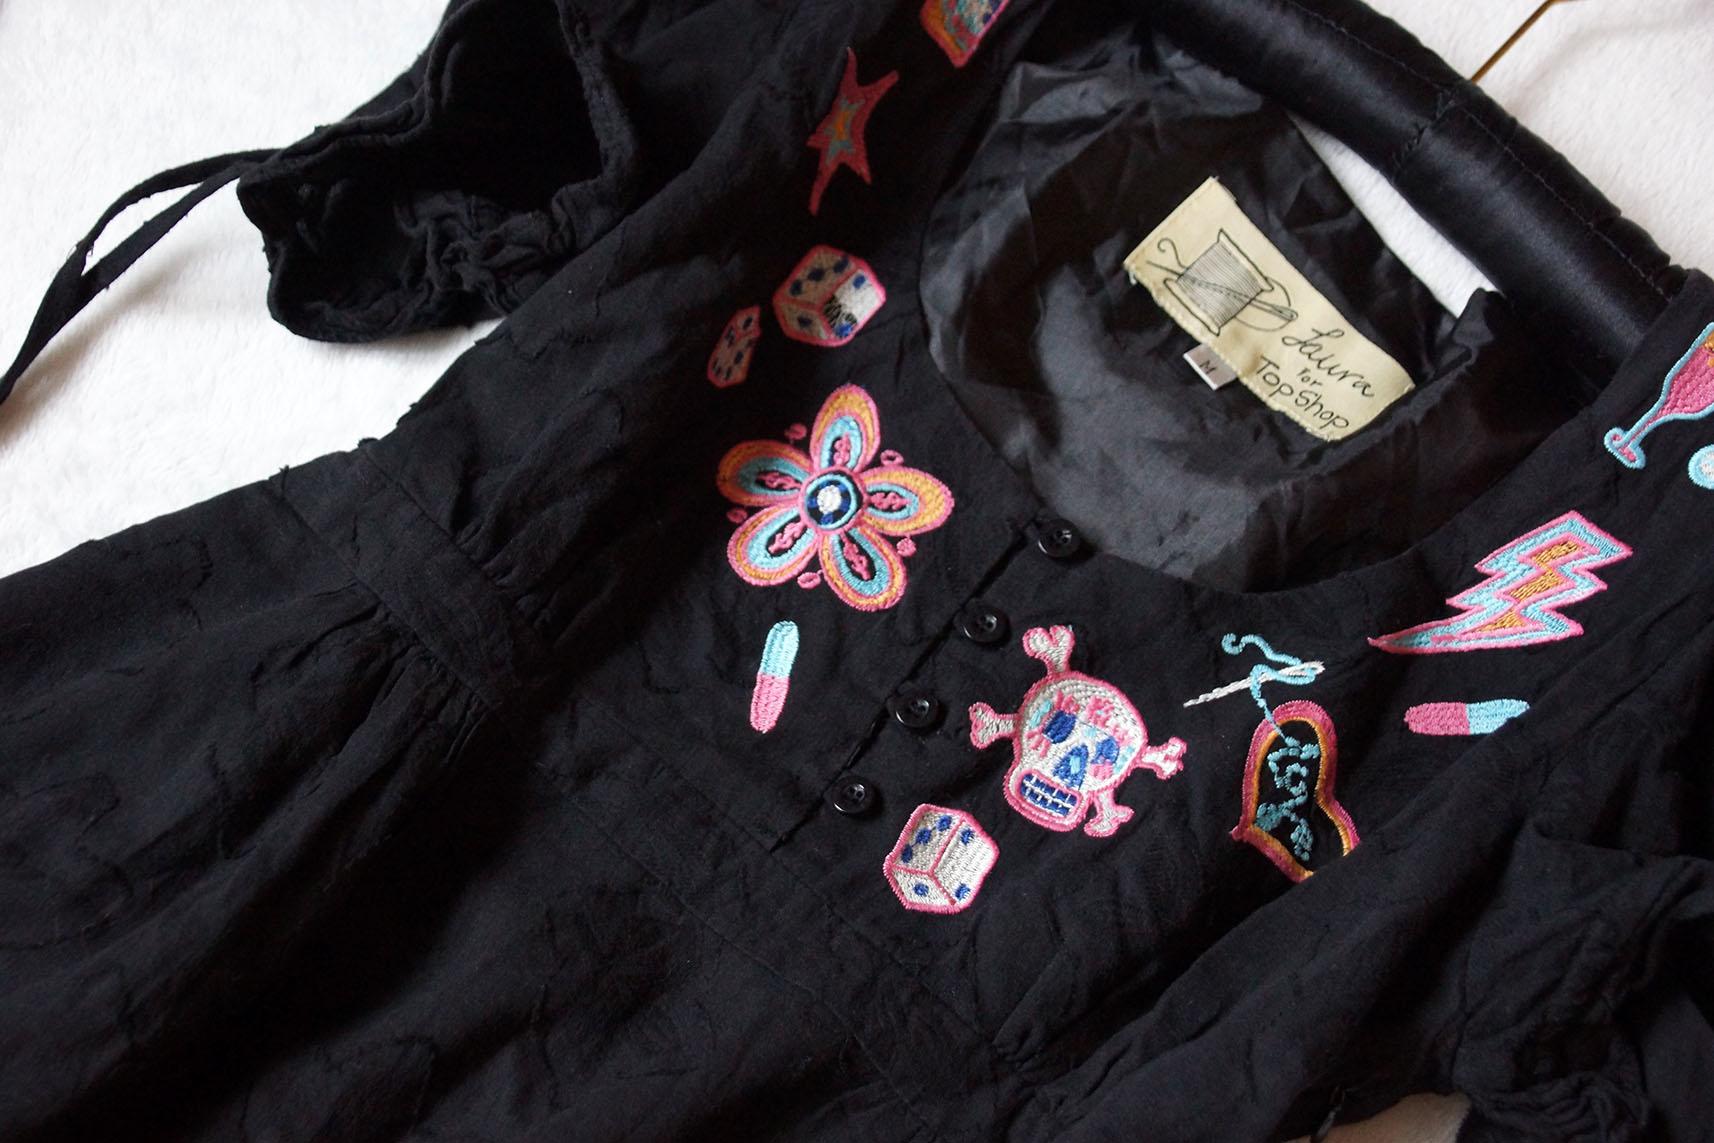 ab28990780 Laura for TOP SHOP Sukienka Hafty Czarna Pin up 38 - 7238952418 ...